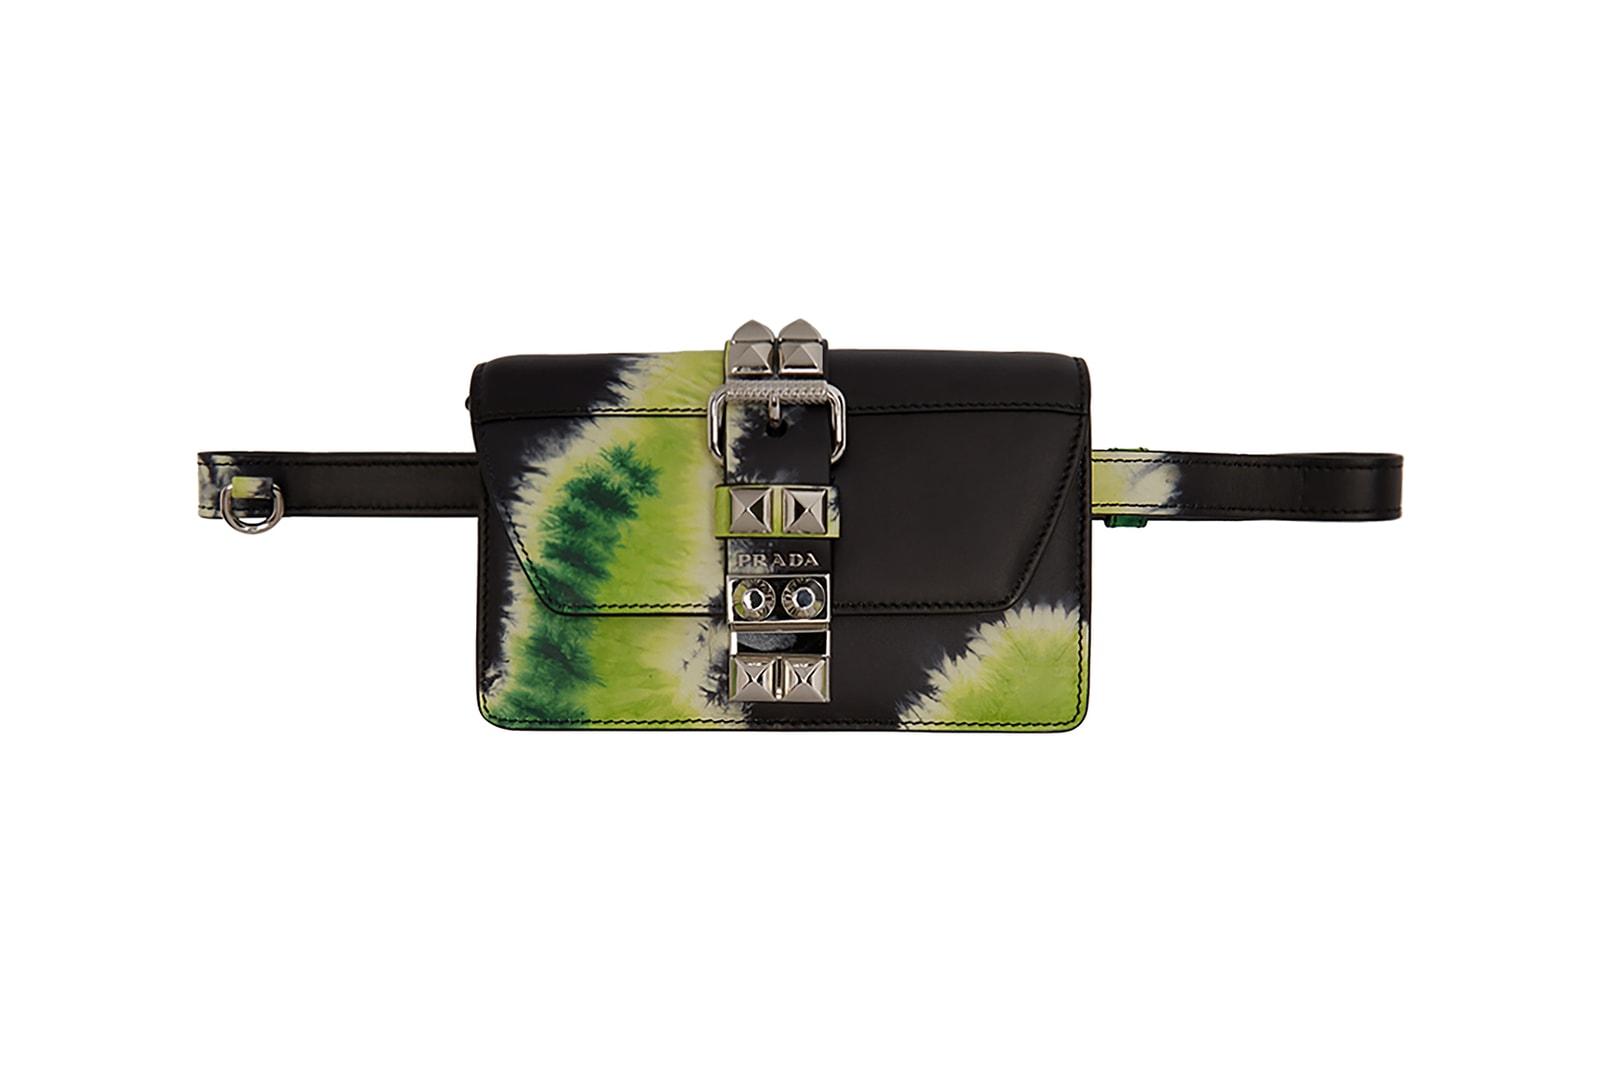 prada ssense tiedye tie dye spring summer bags wallets iphone case card holder bag wallet jacket shorts